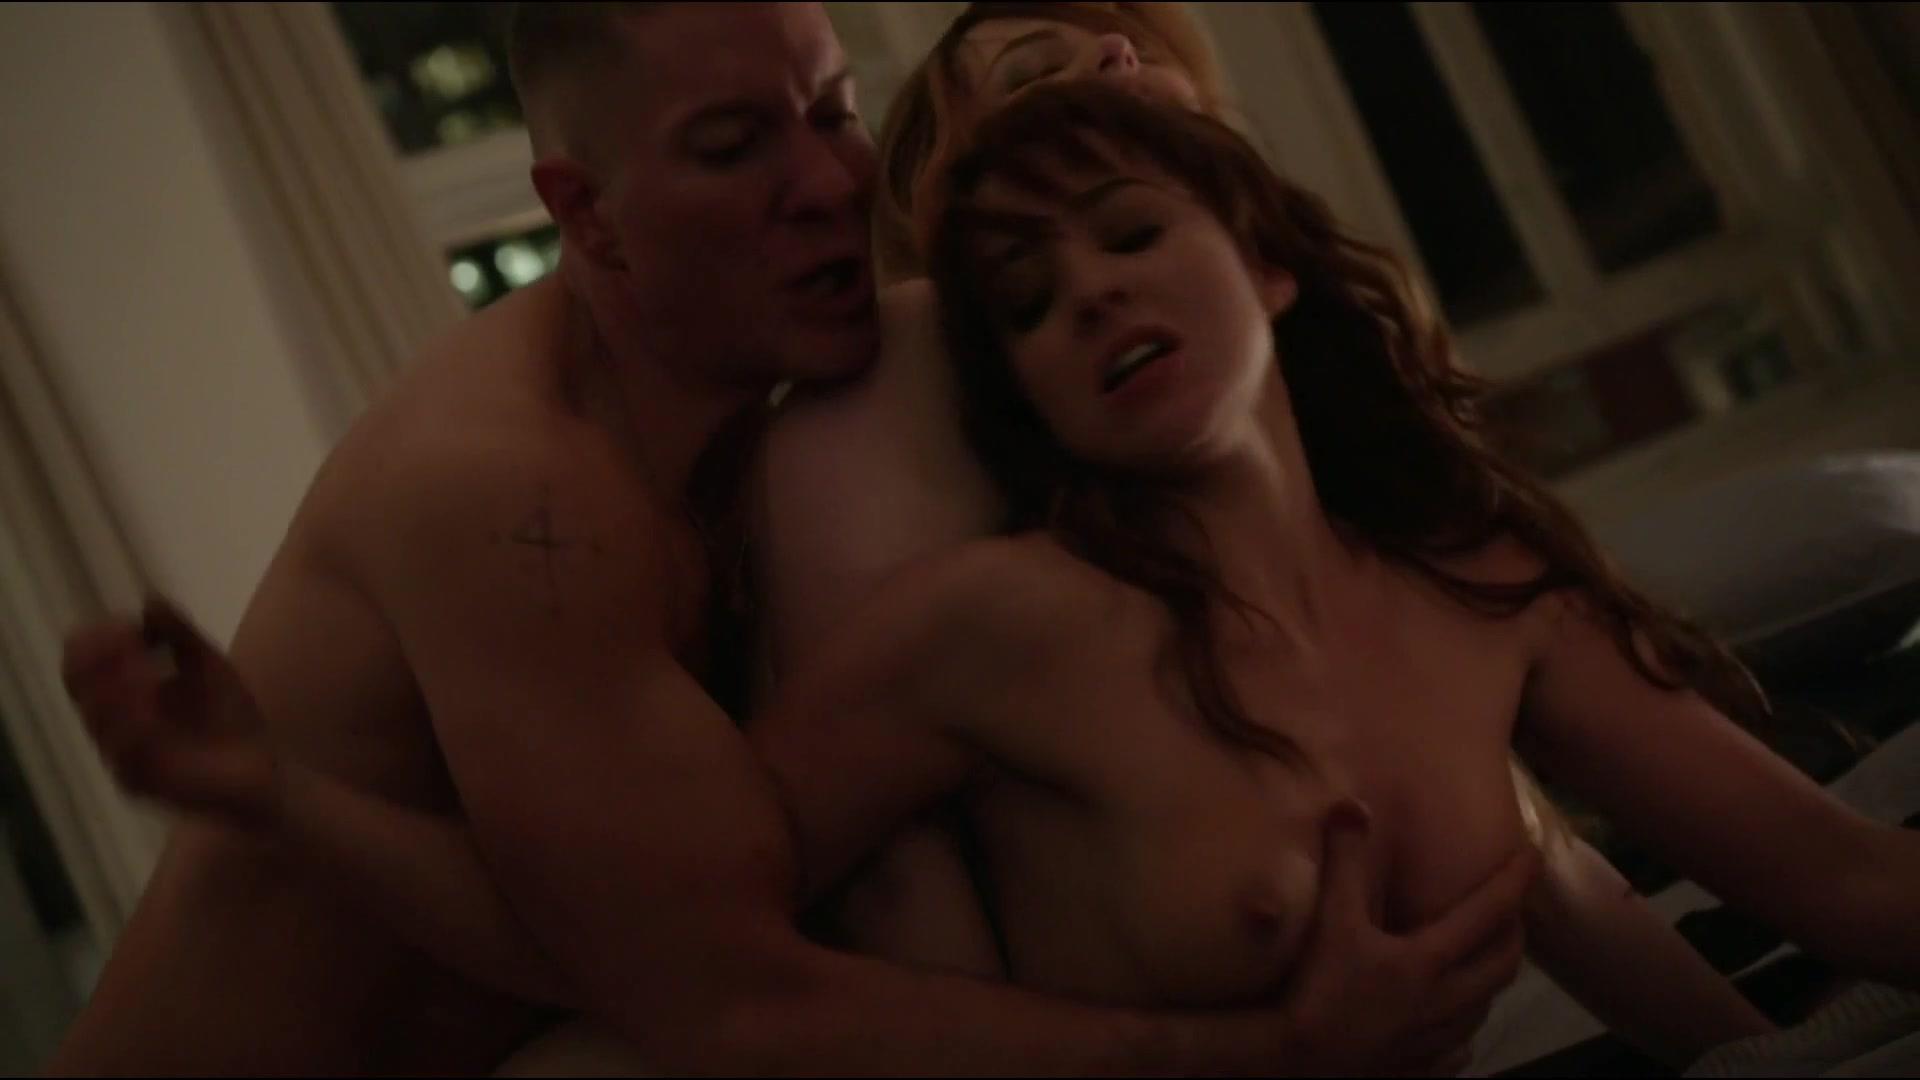 Celebrity Threesome Sex Scenes